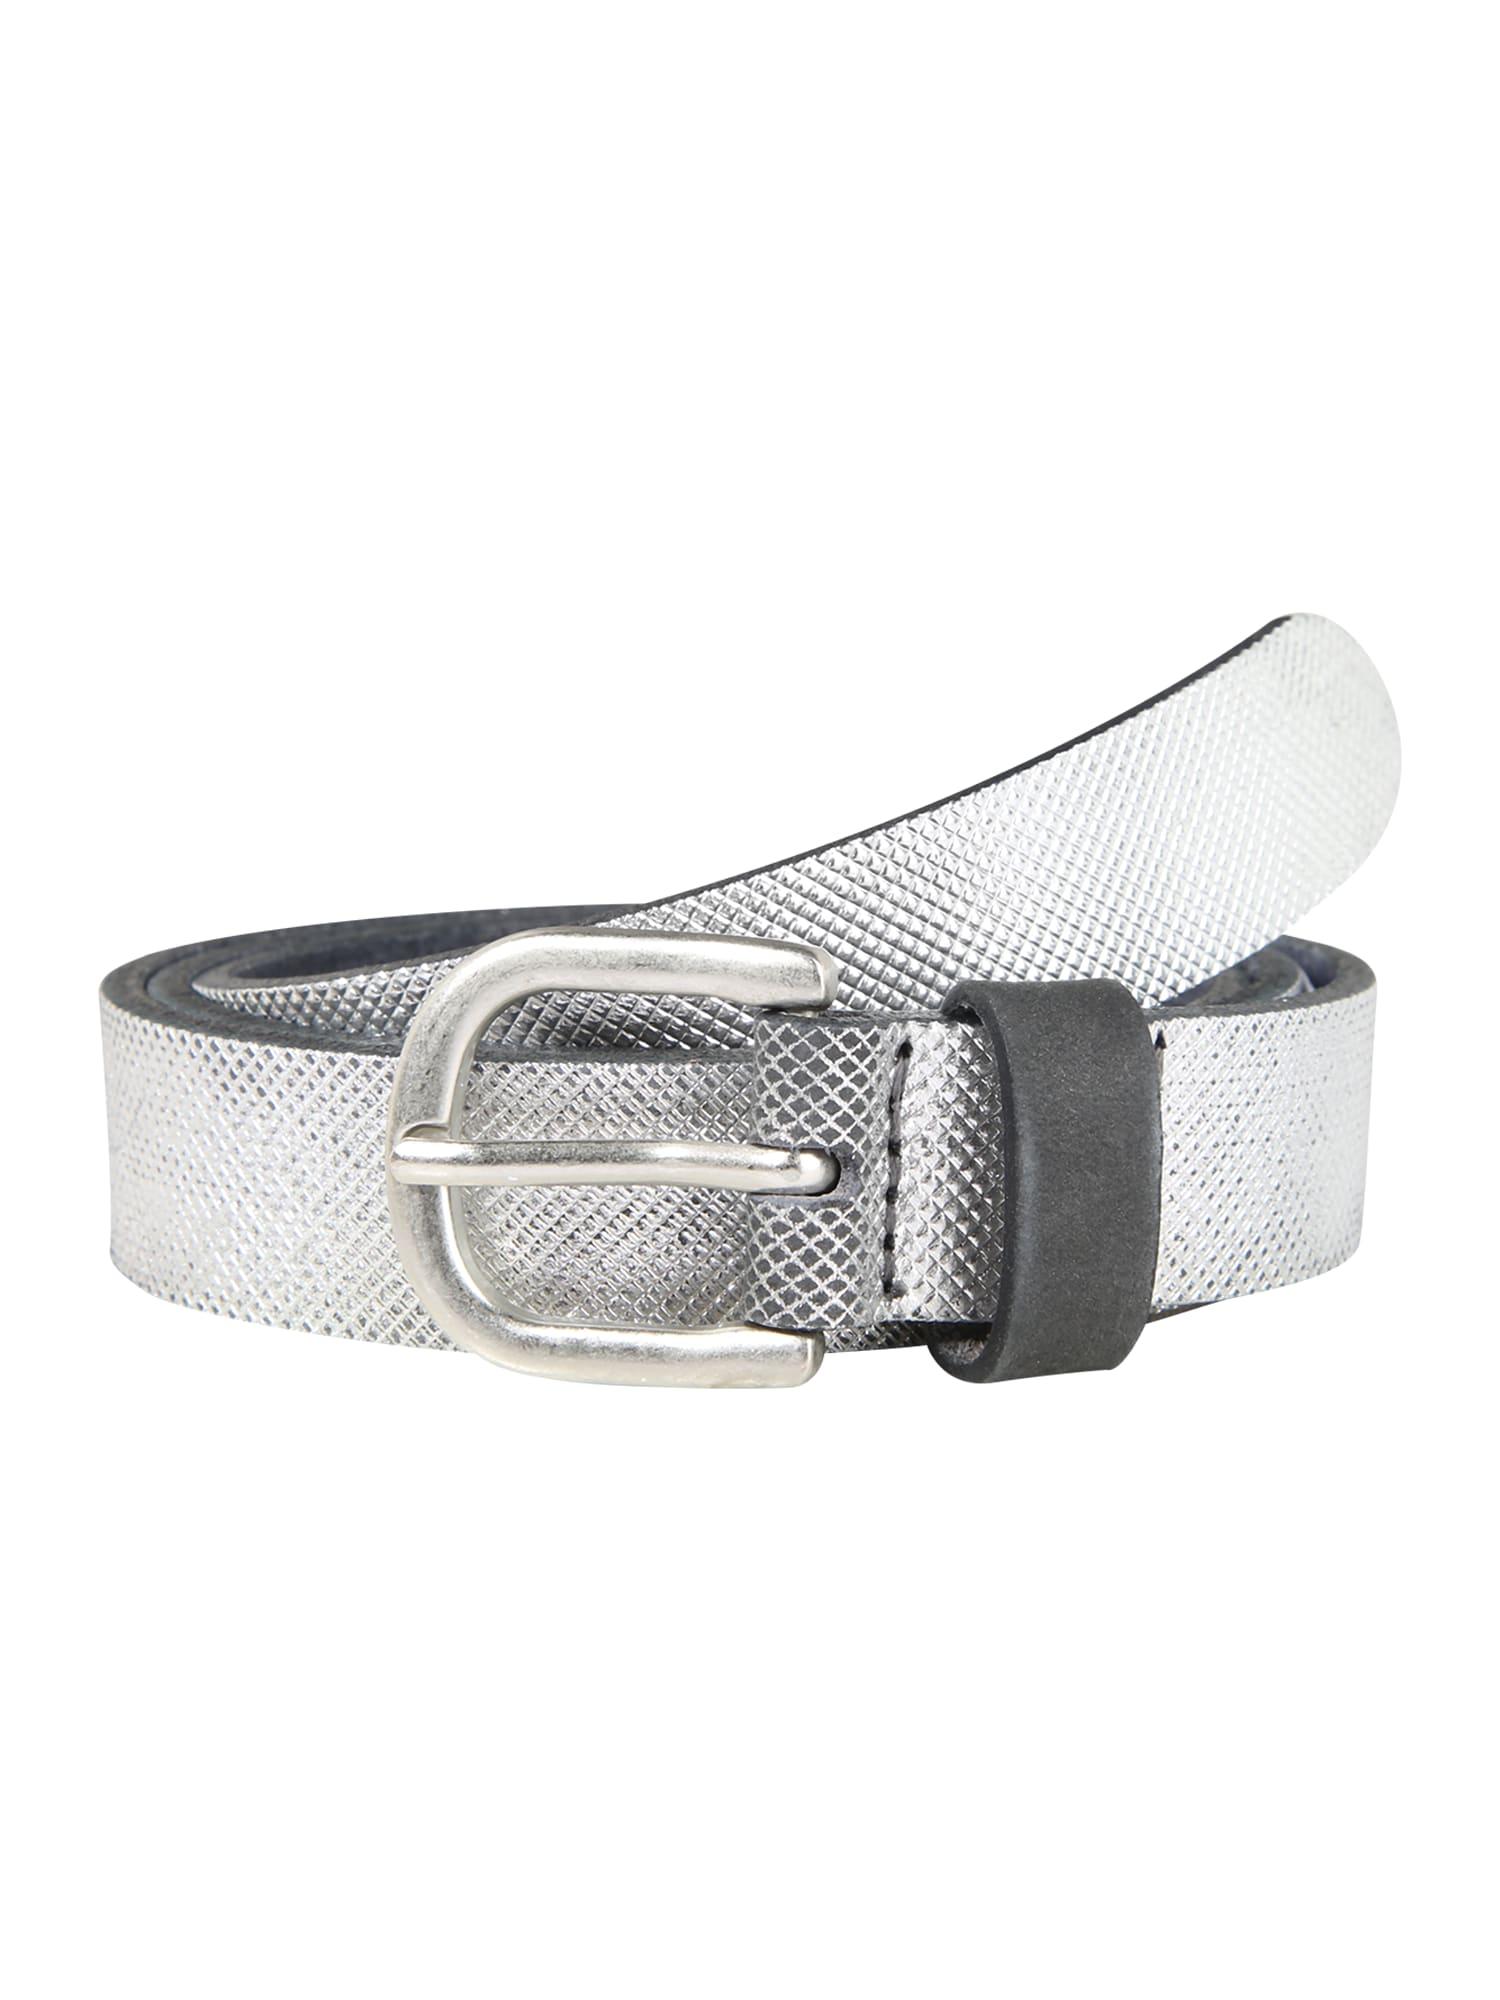 ESPRIT Diržas 'EmbossedBelt' sidabro pilka